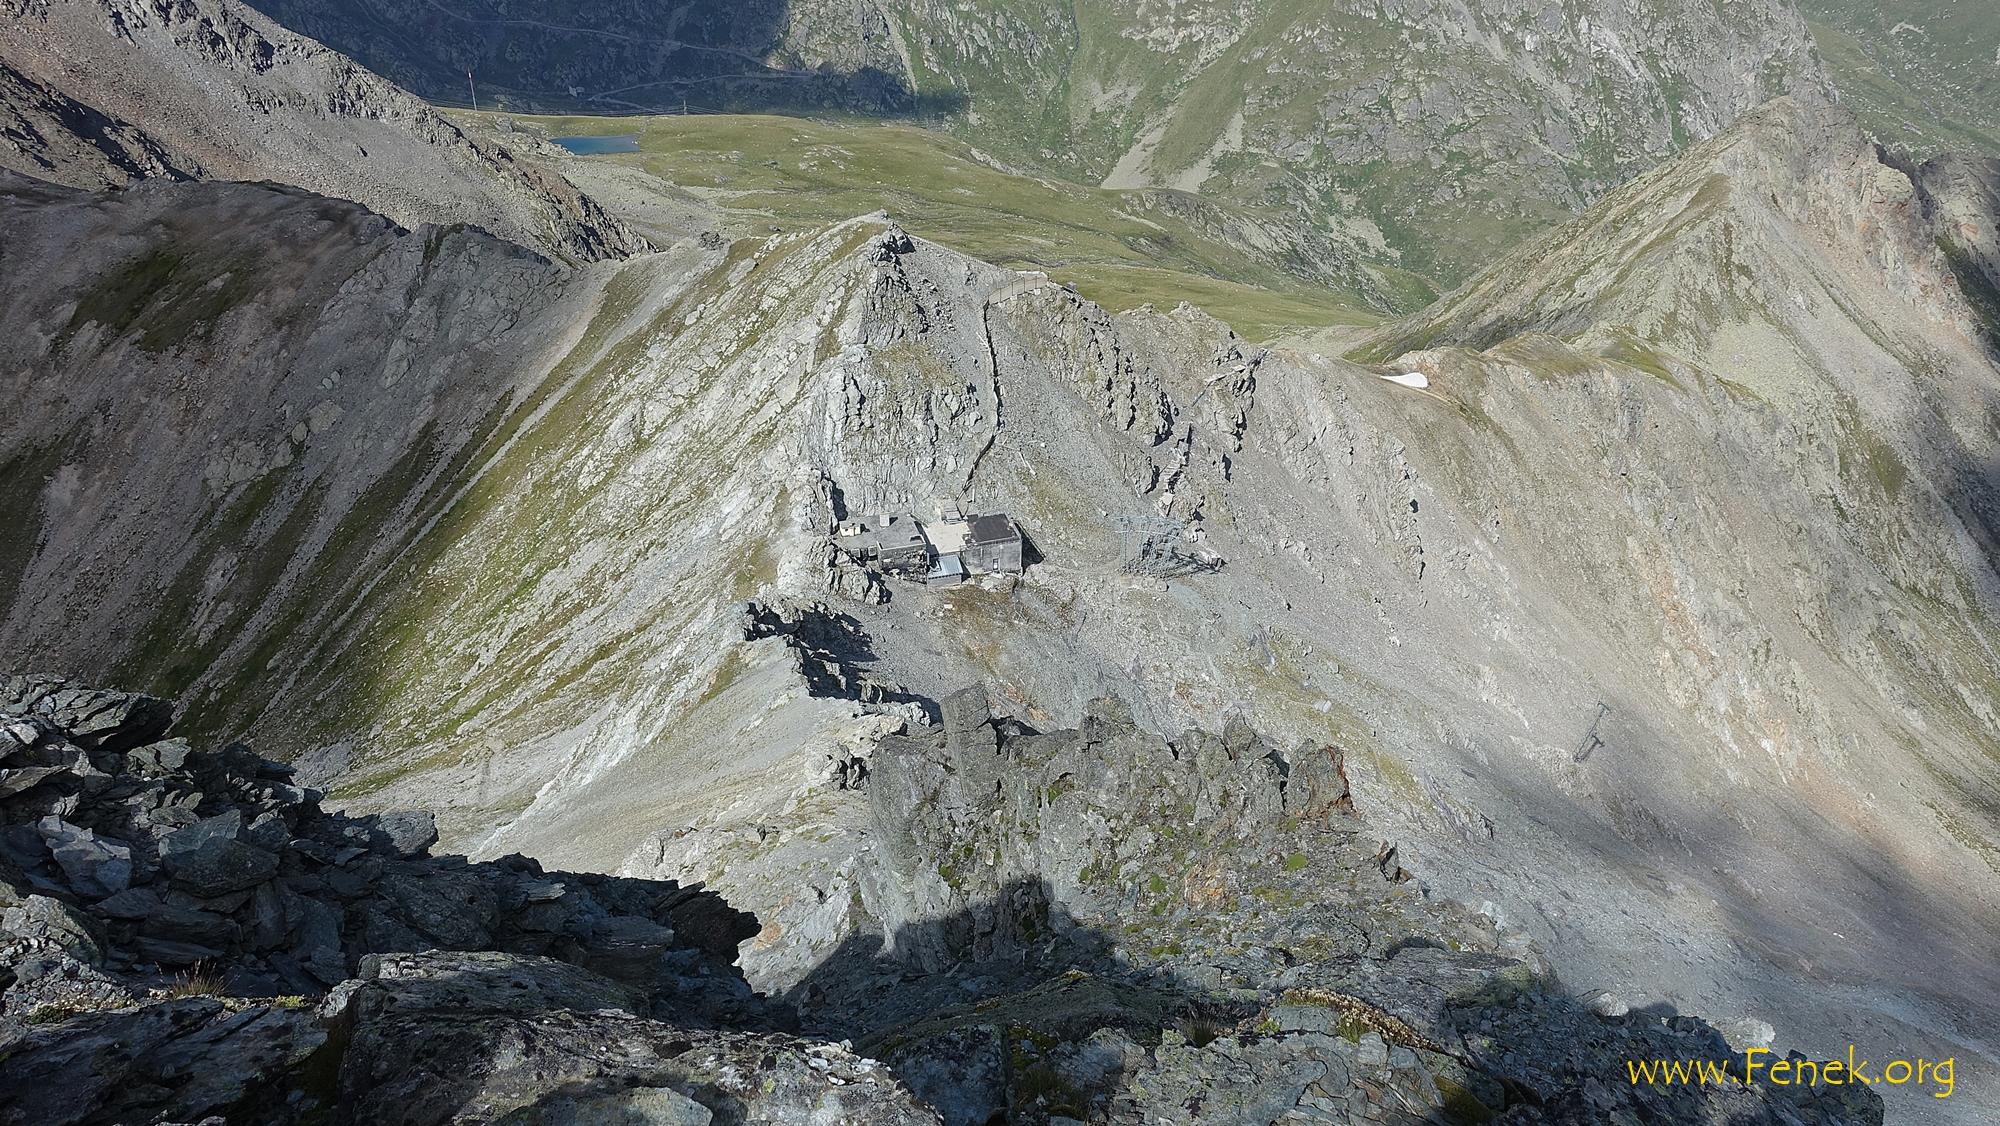 Tiefblick zum Col Nord de Menouve wo ich aufgestiegen bin